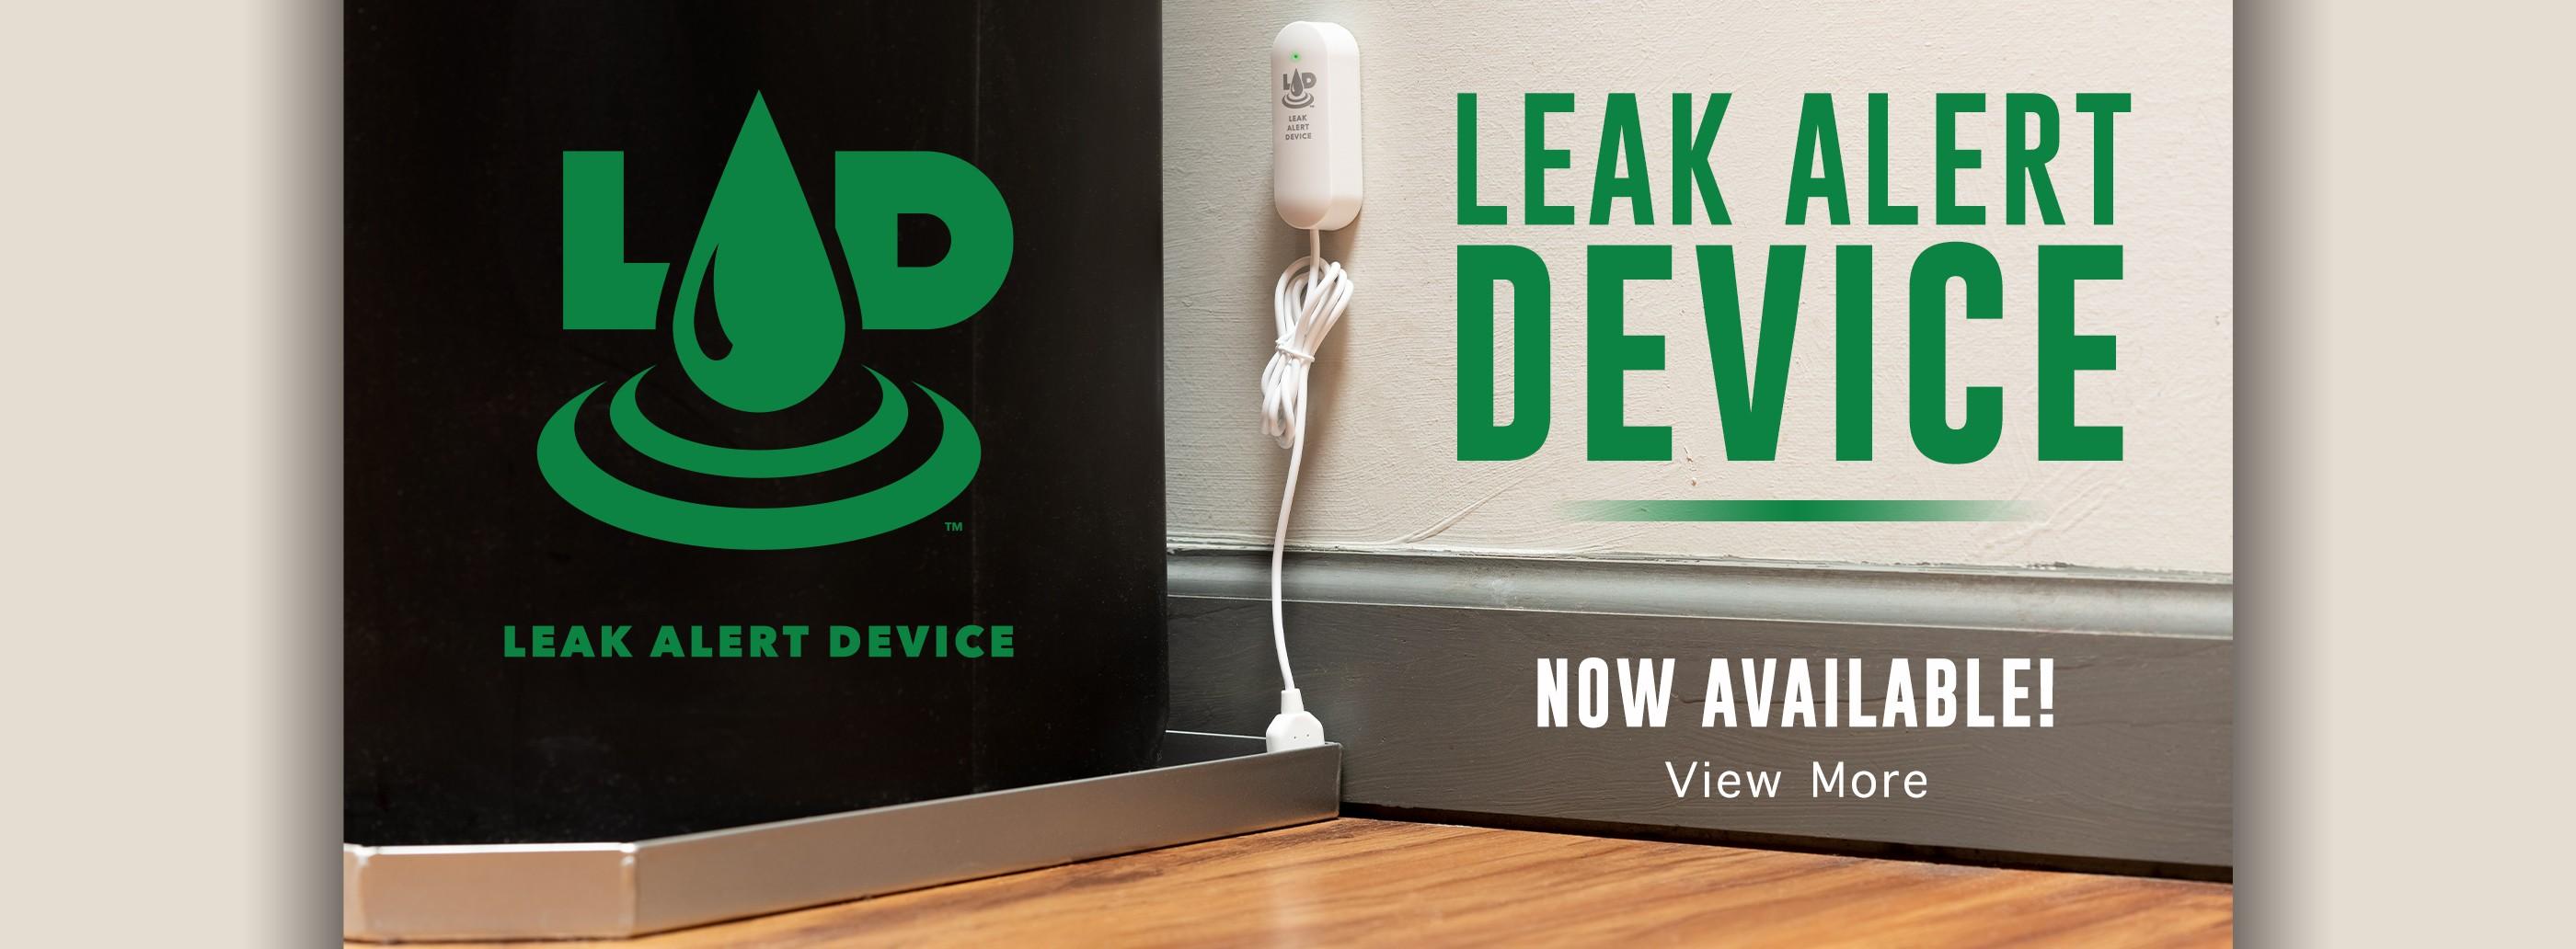 Leak Alert Device